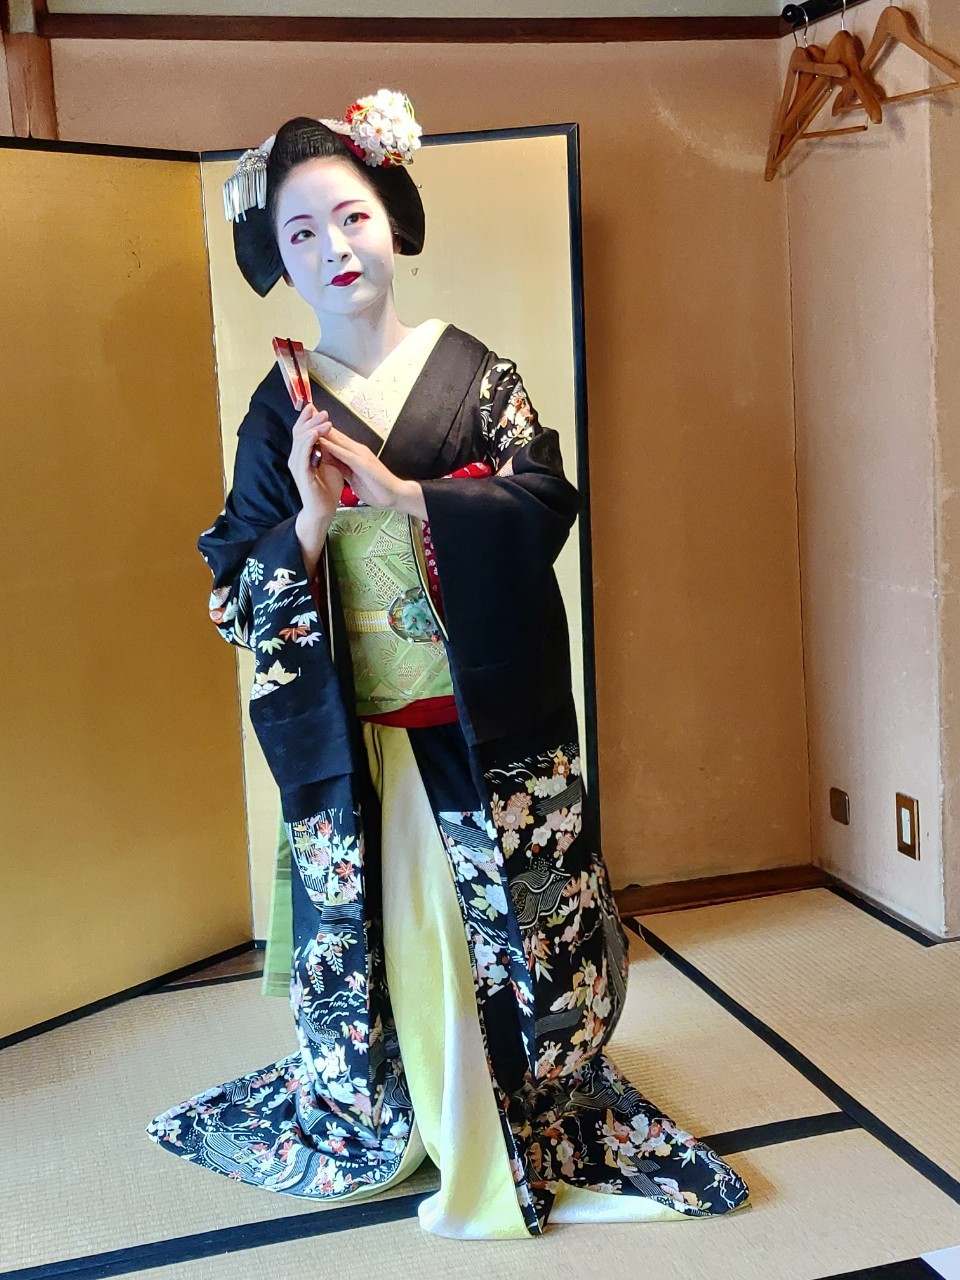 Bonyo James 邦友帶你玩日本 京都藝妓體驗 花見舞妓